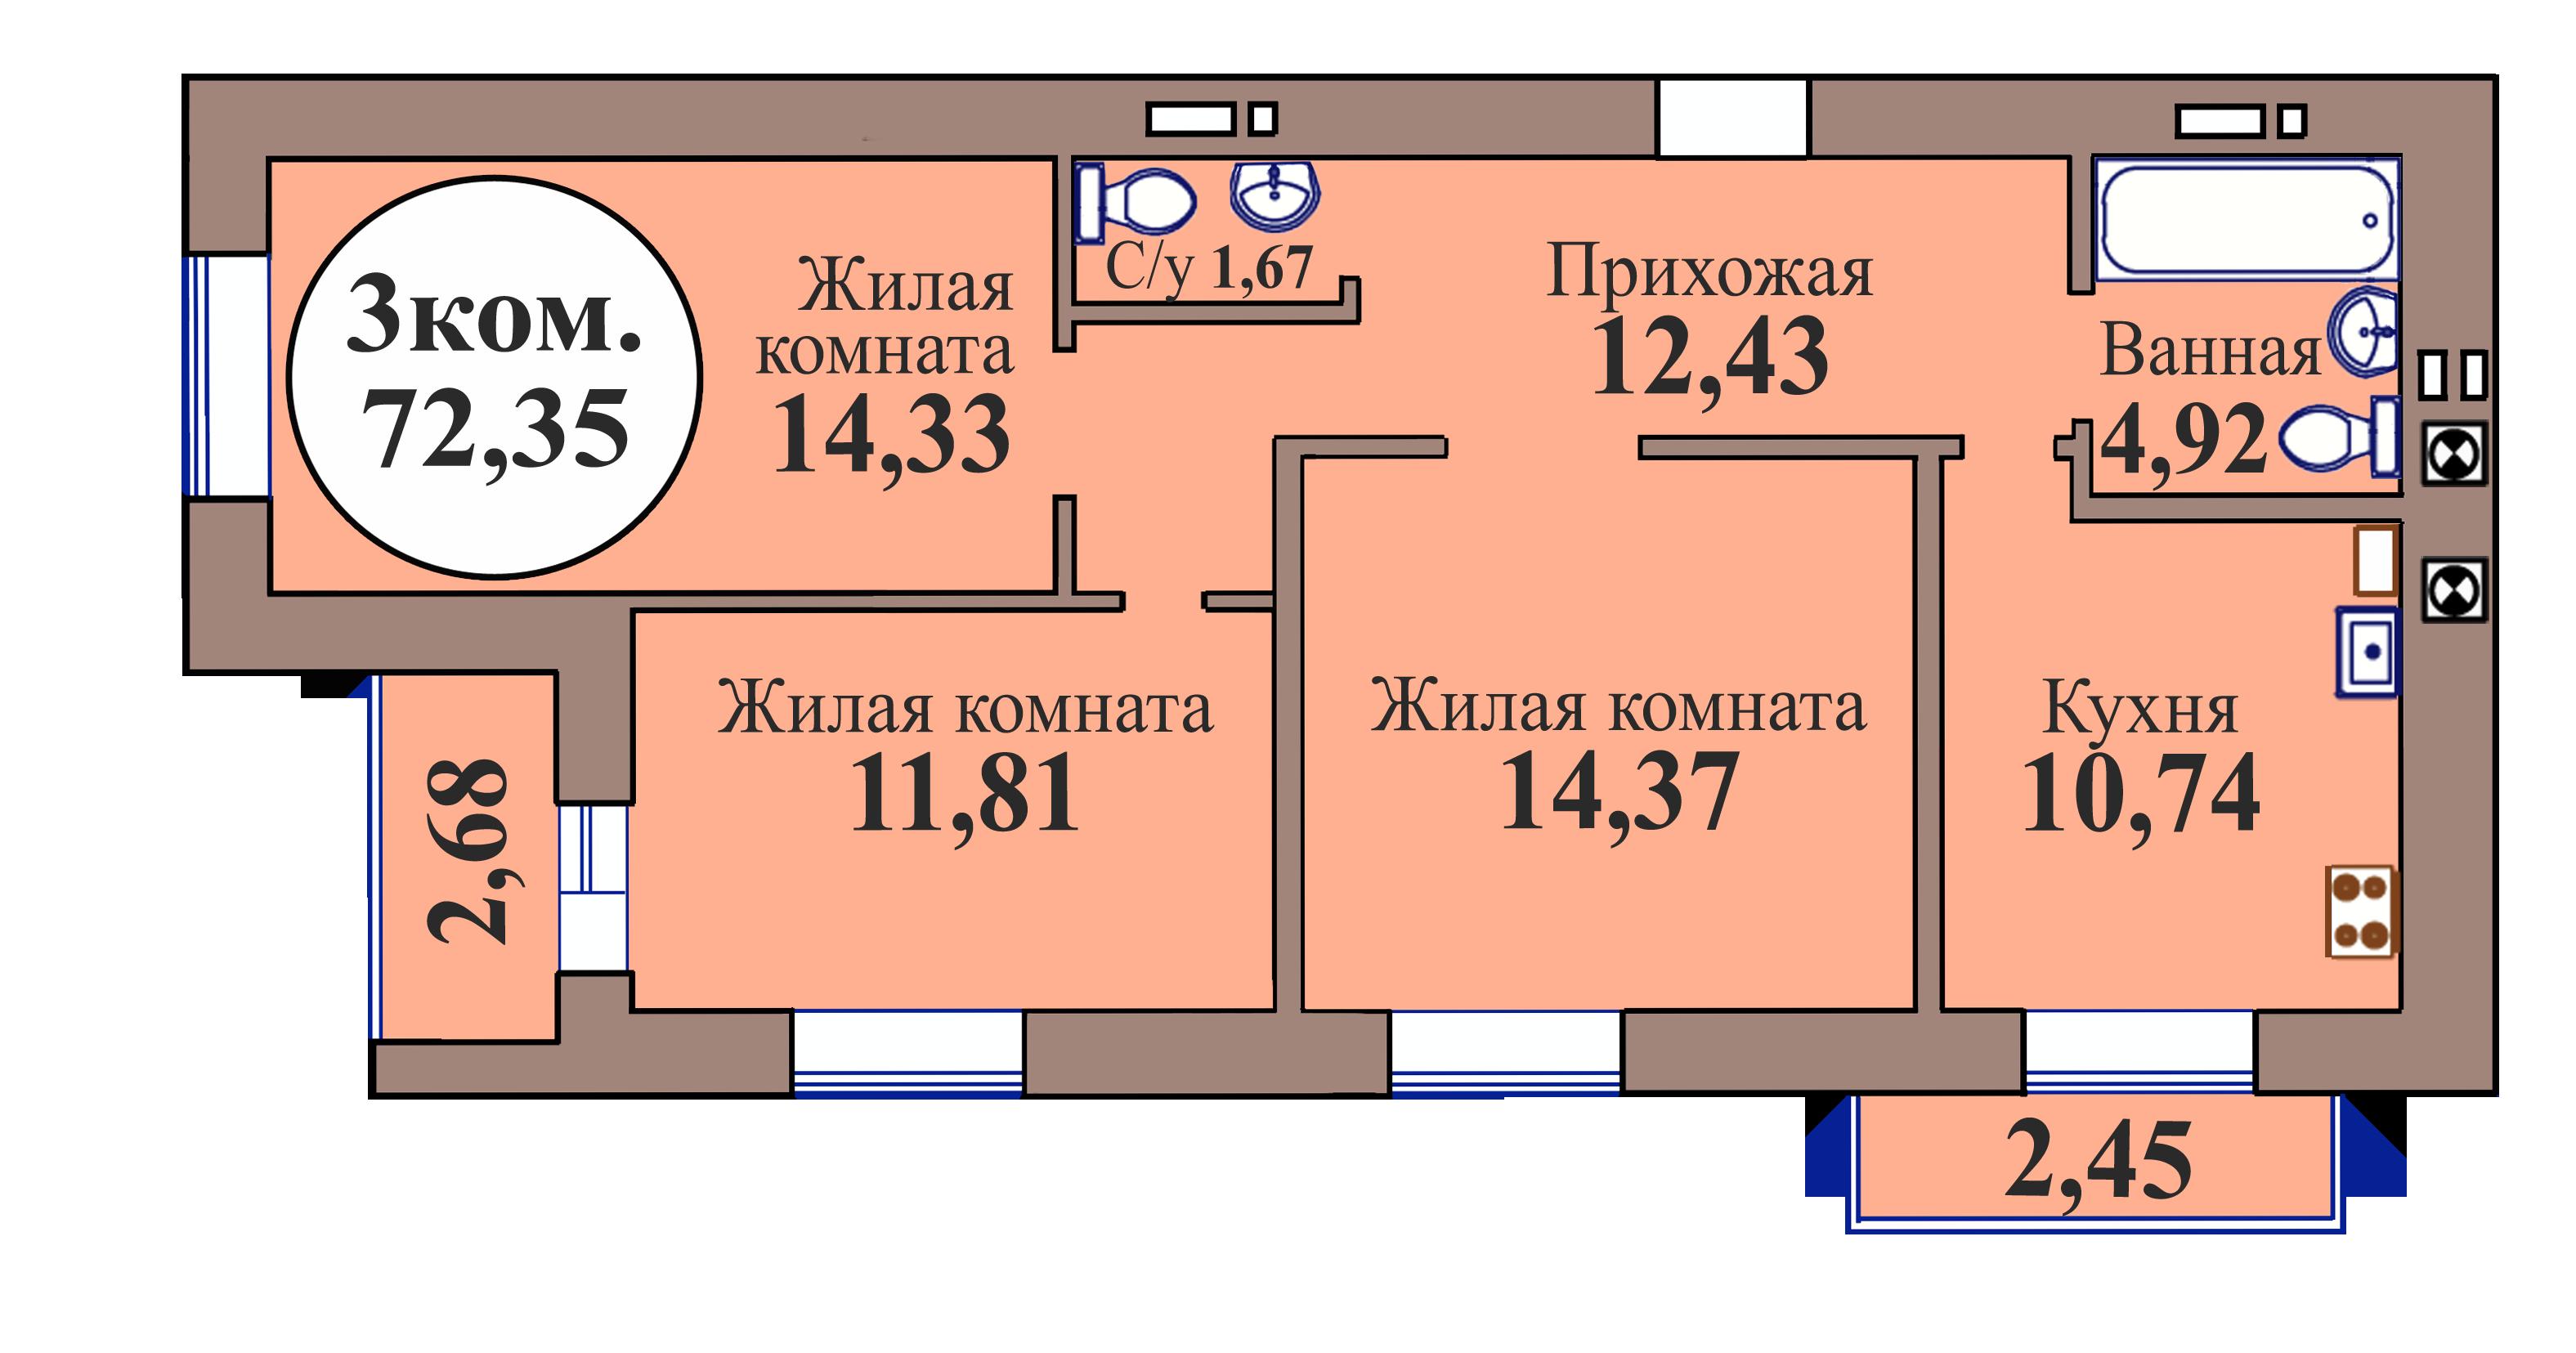 3-комн. кв. по пер. Калининградский, 5 кв. 182 в Калининграде